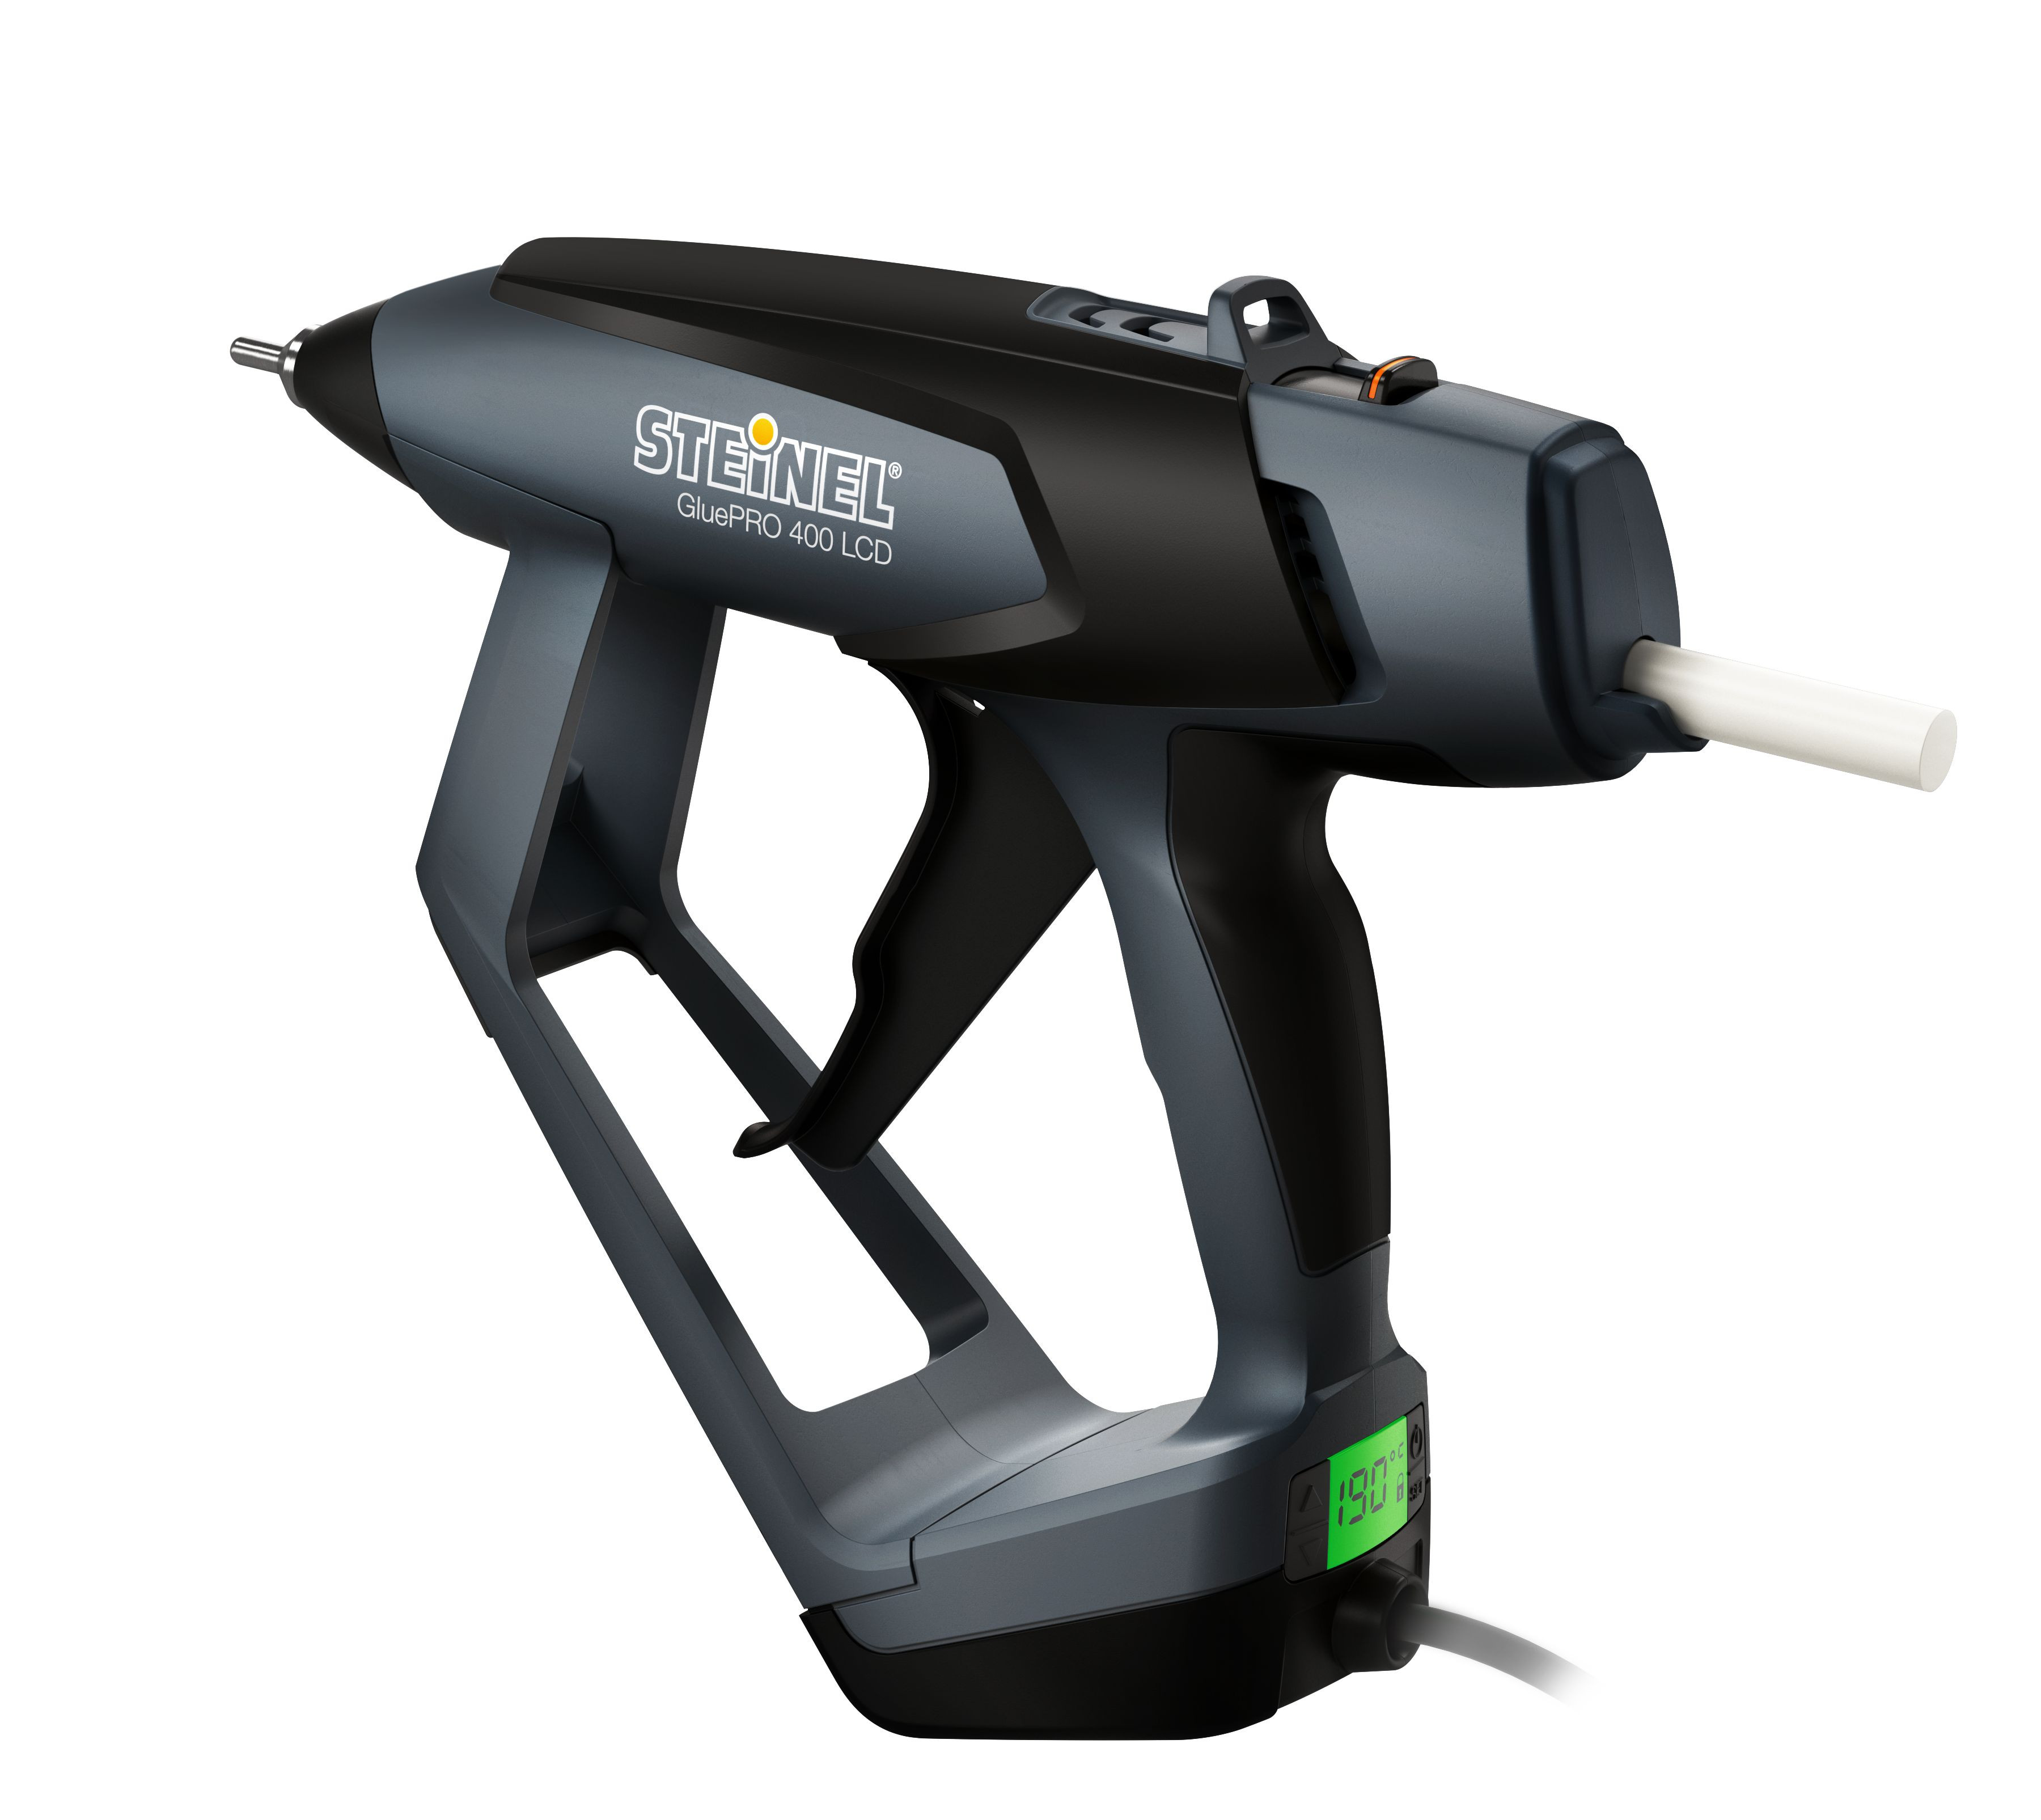 GluePro 400 LCD Glue Gun